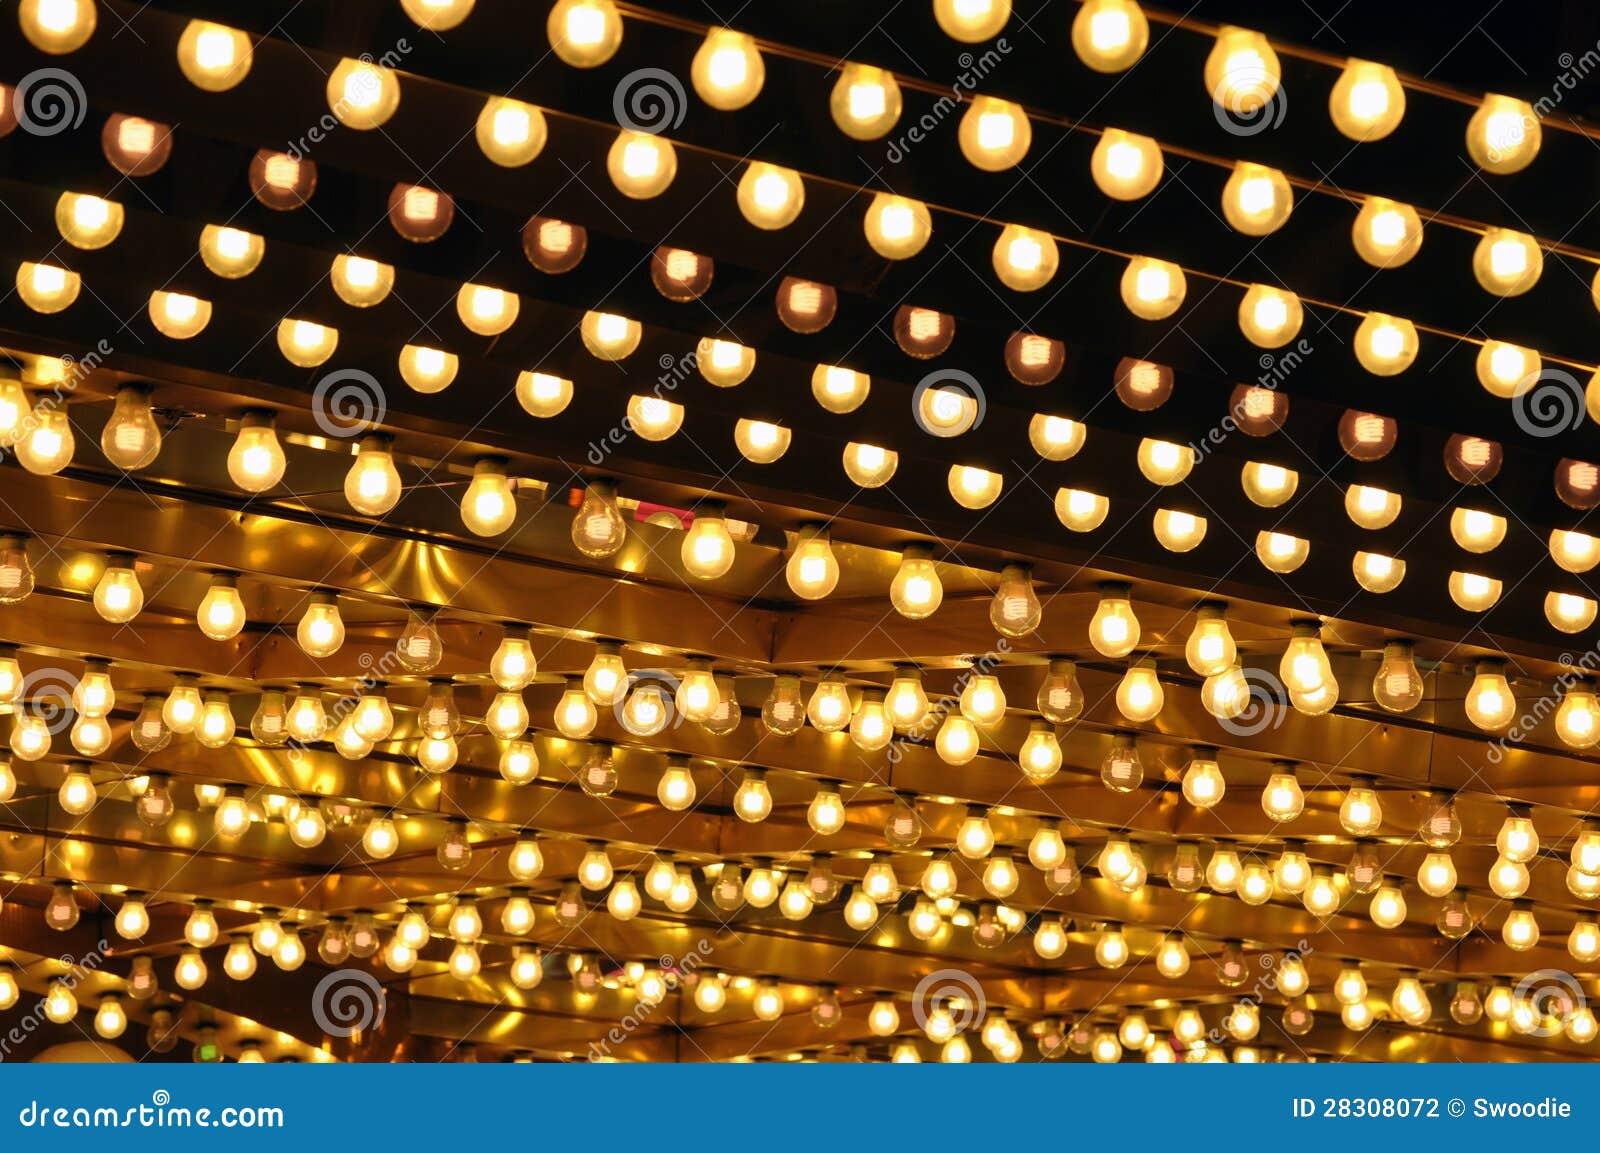 Broadway Lights Marquee Golden bulbs marquee Stock